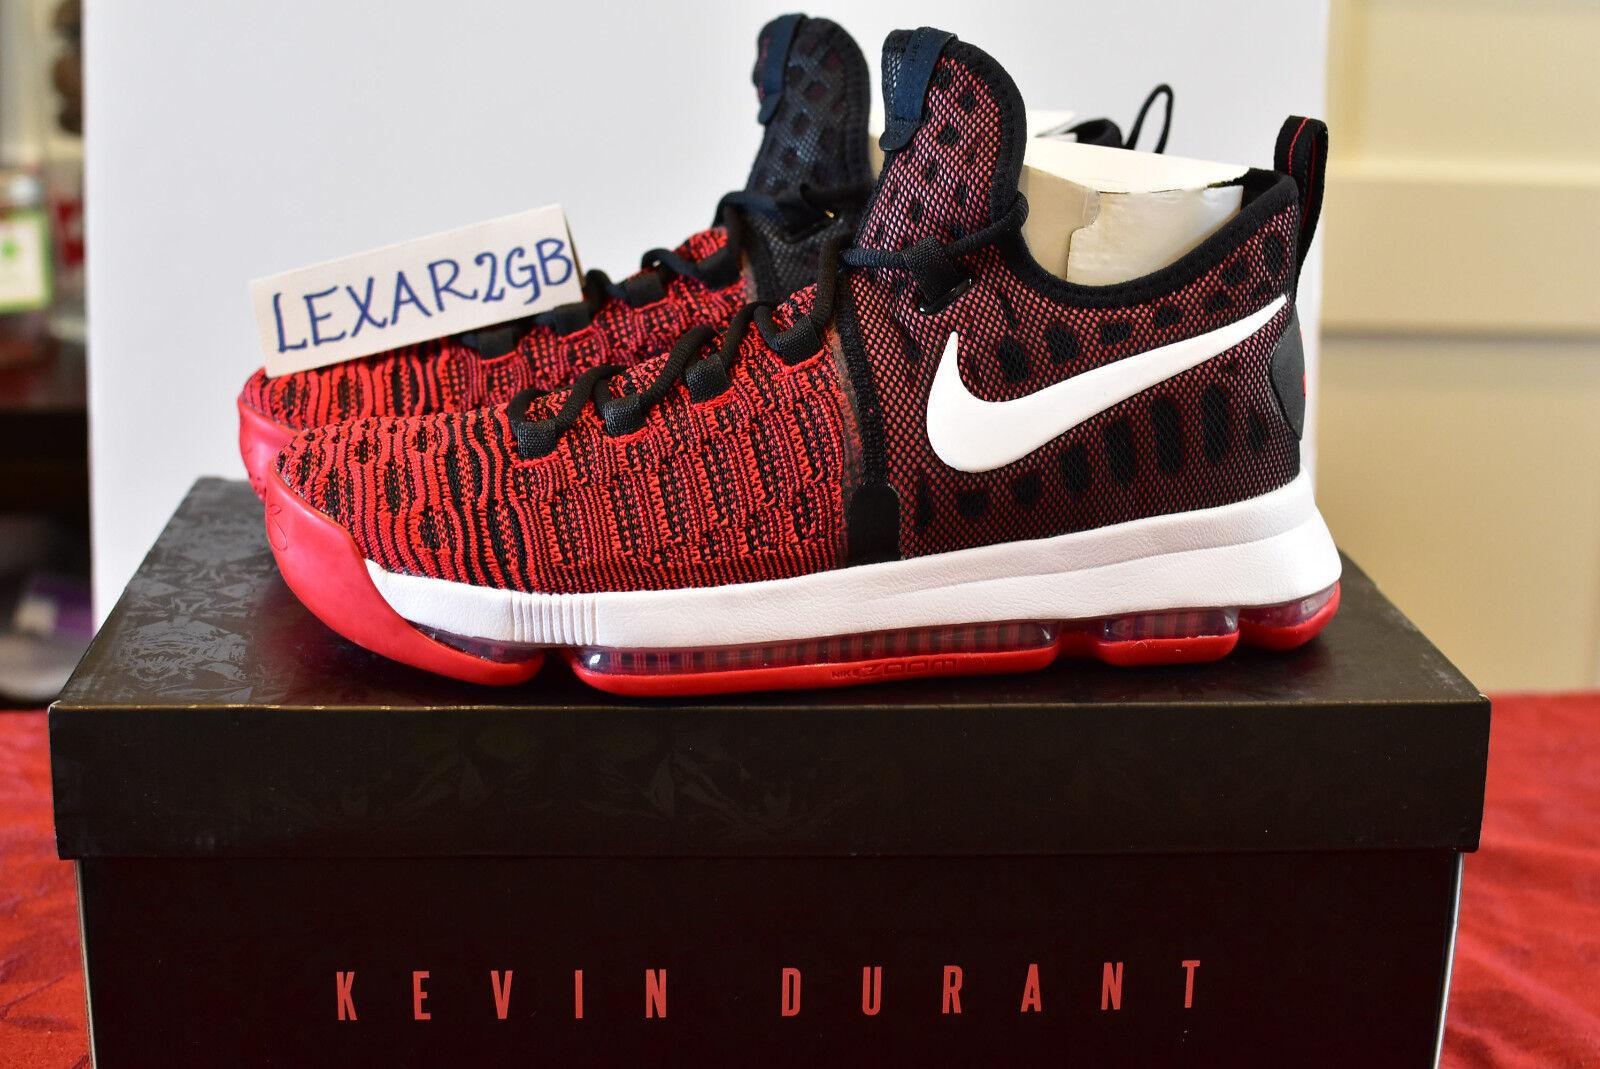 Nike Zoom KD 9 KEVIN DURANT University Red White Black SZ 9.5  (843392 610)